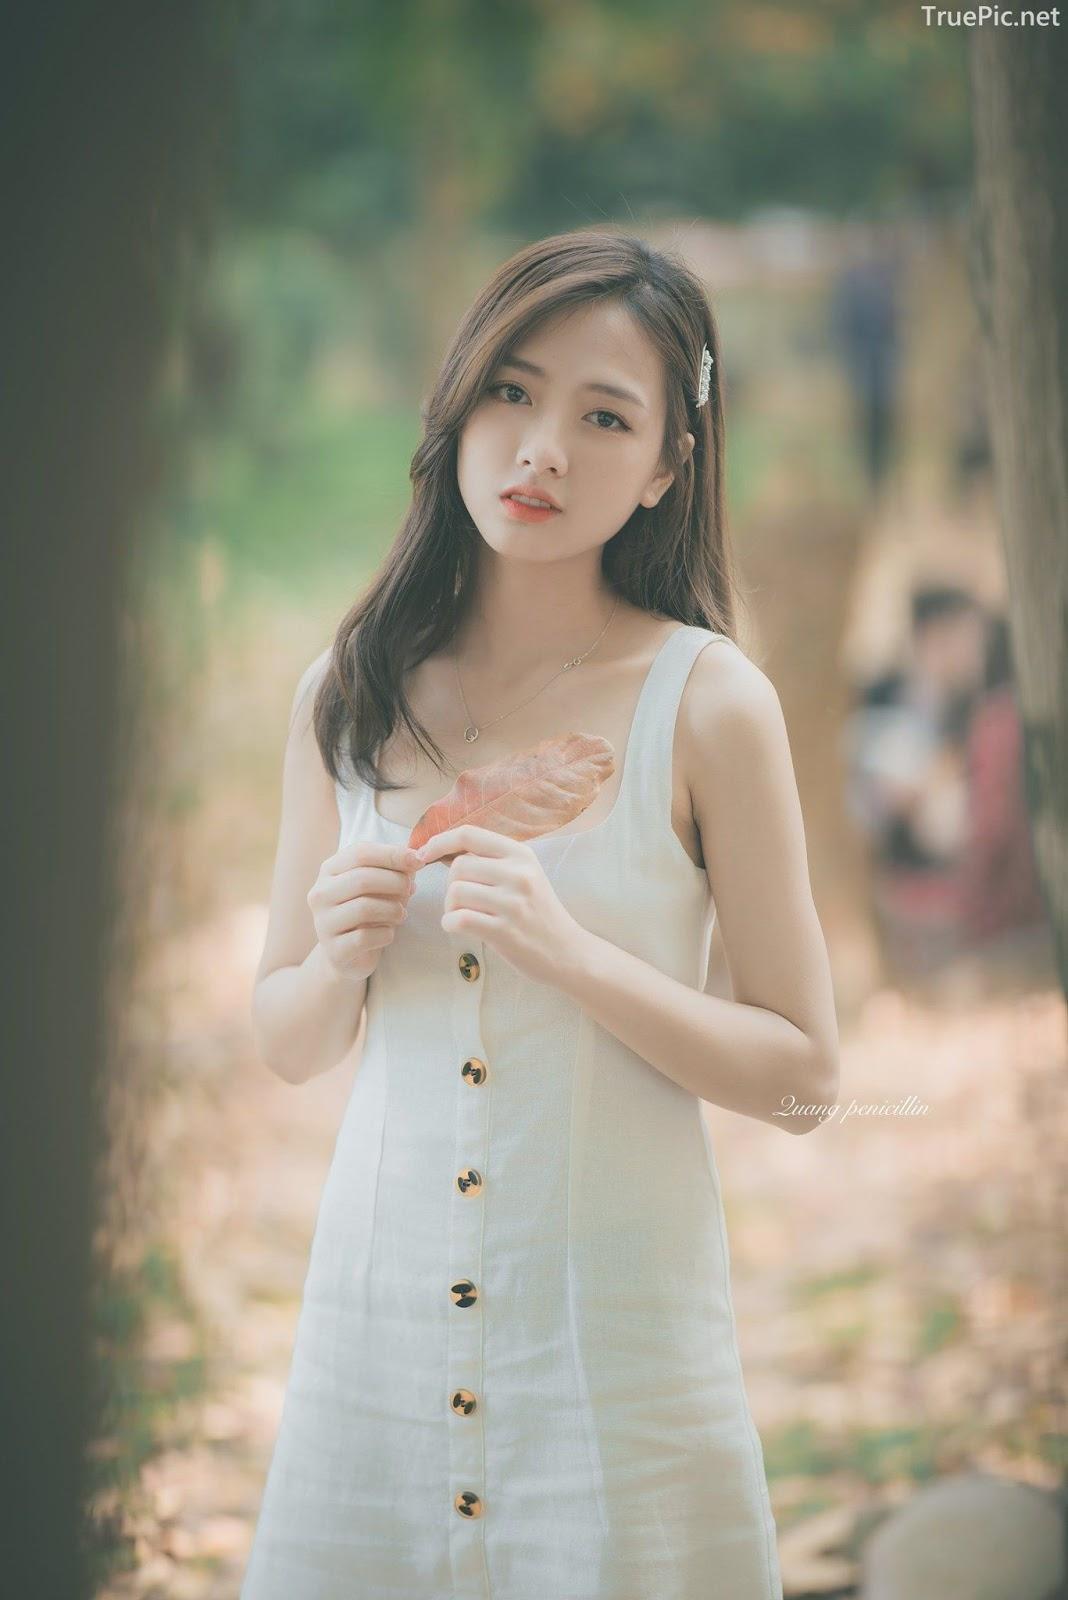 Vietnamese Hot Girl Linh Hoai - Season of falling leaves - TruePic.net - Picture 6